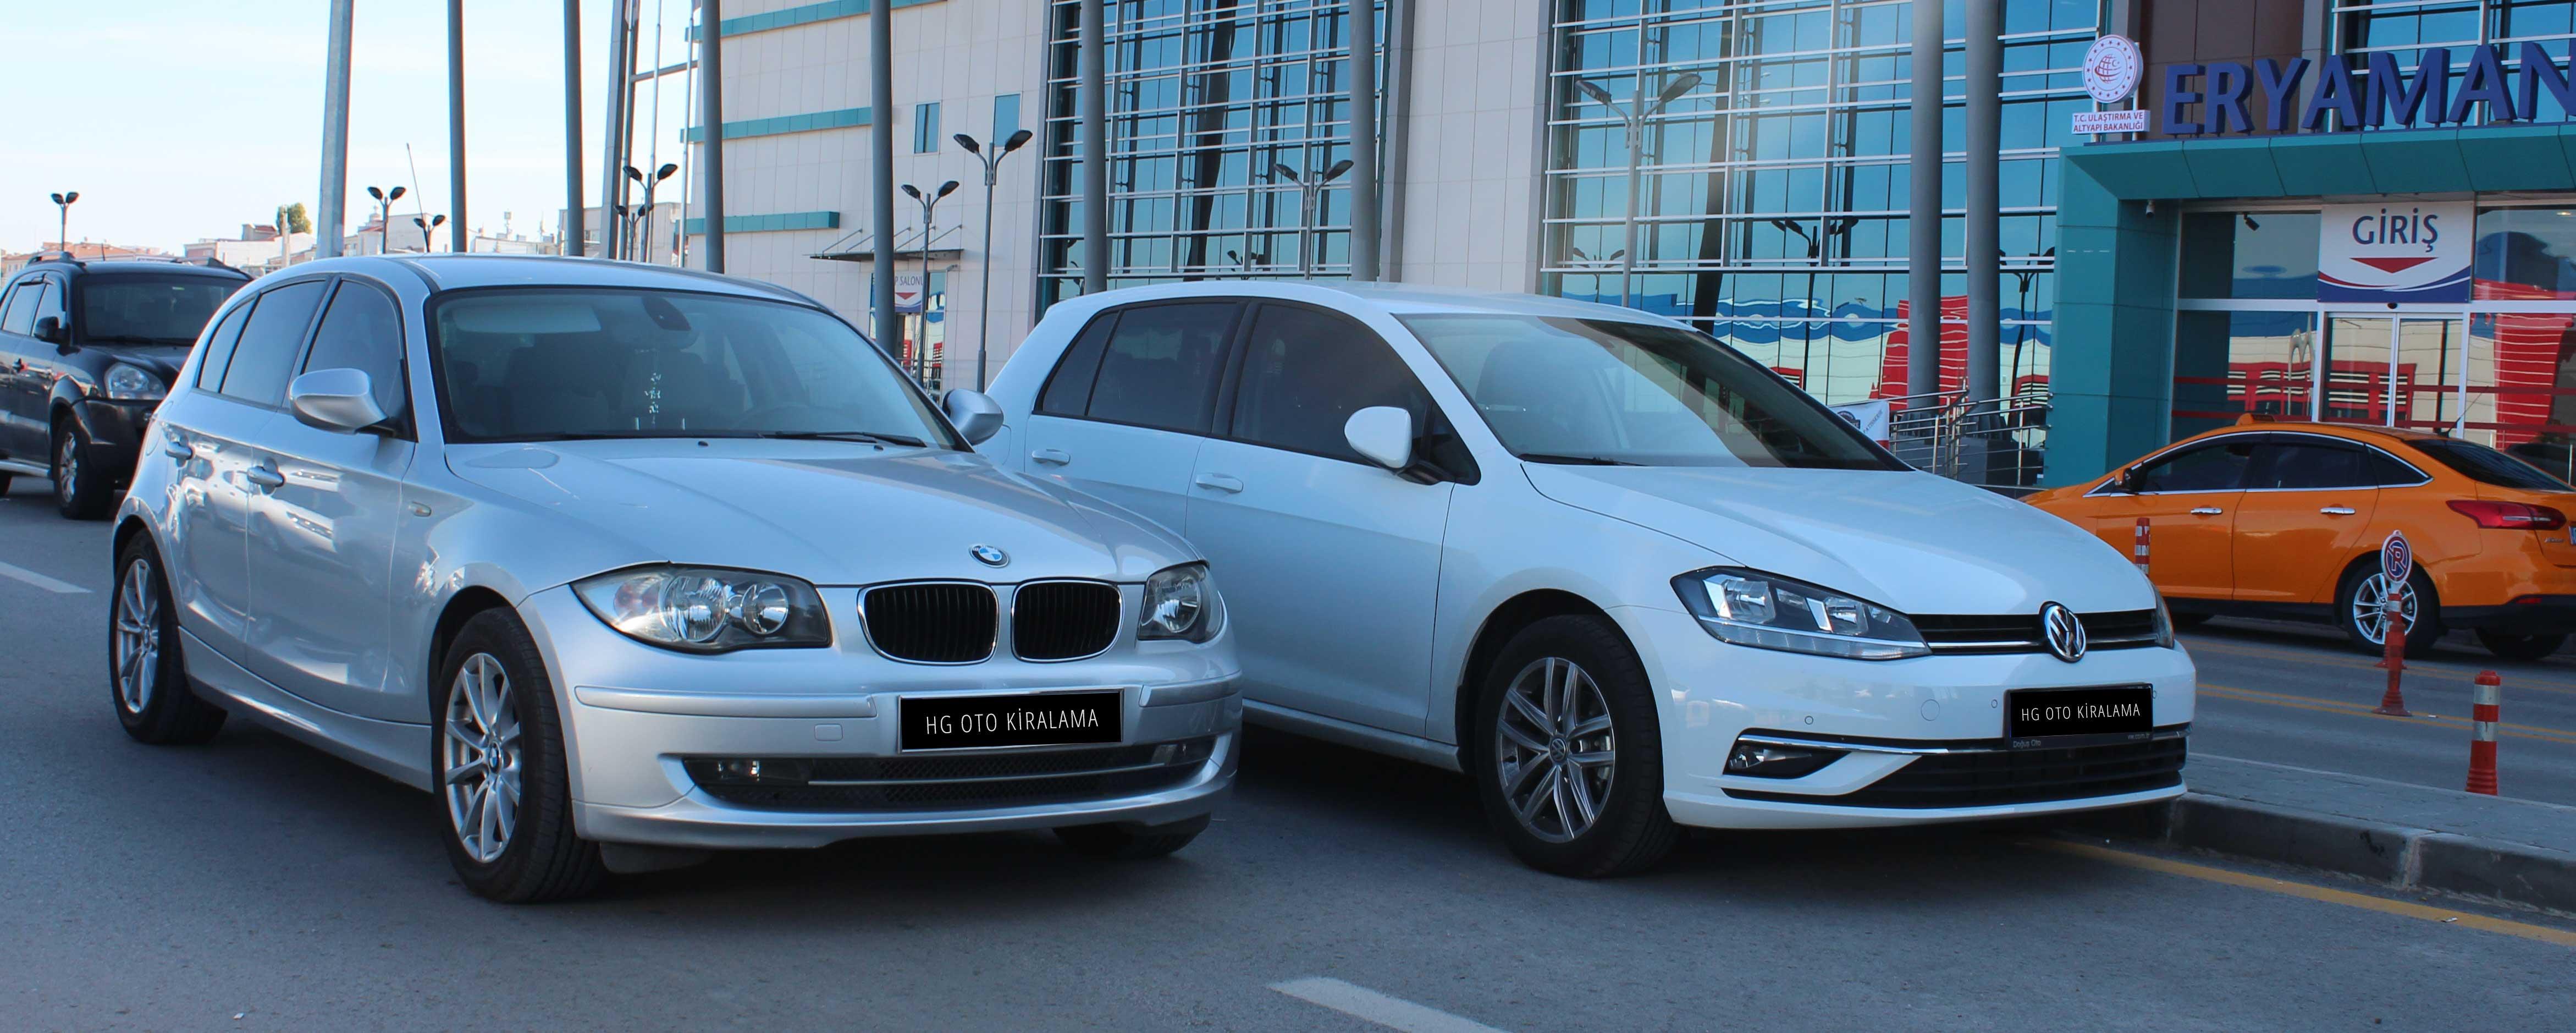 HG Eryaman YHT Oto Kiralama - Rent A Car - 0555 142 15 13 - Slider Fotoğrafı